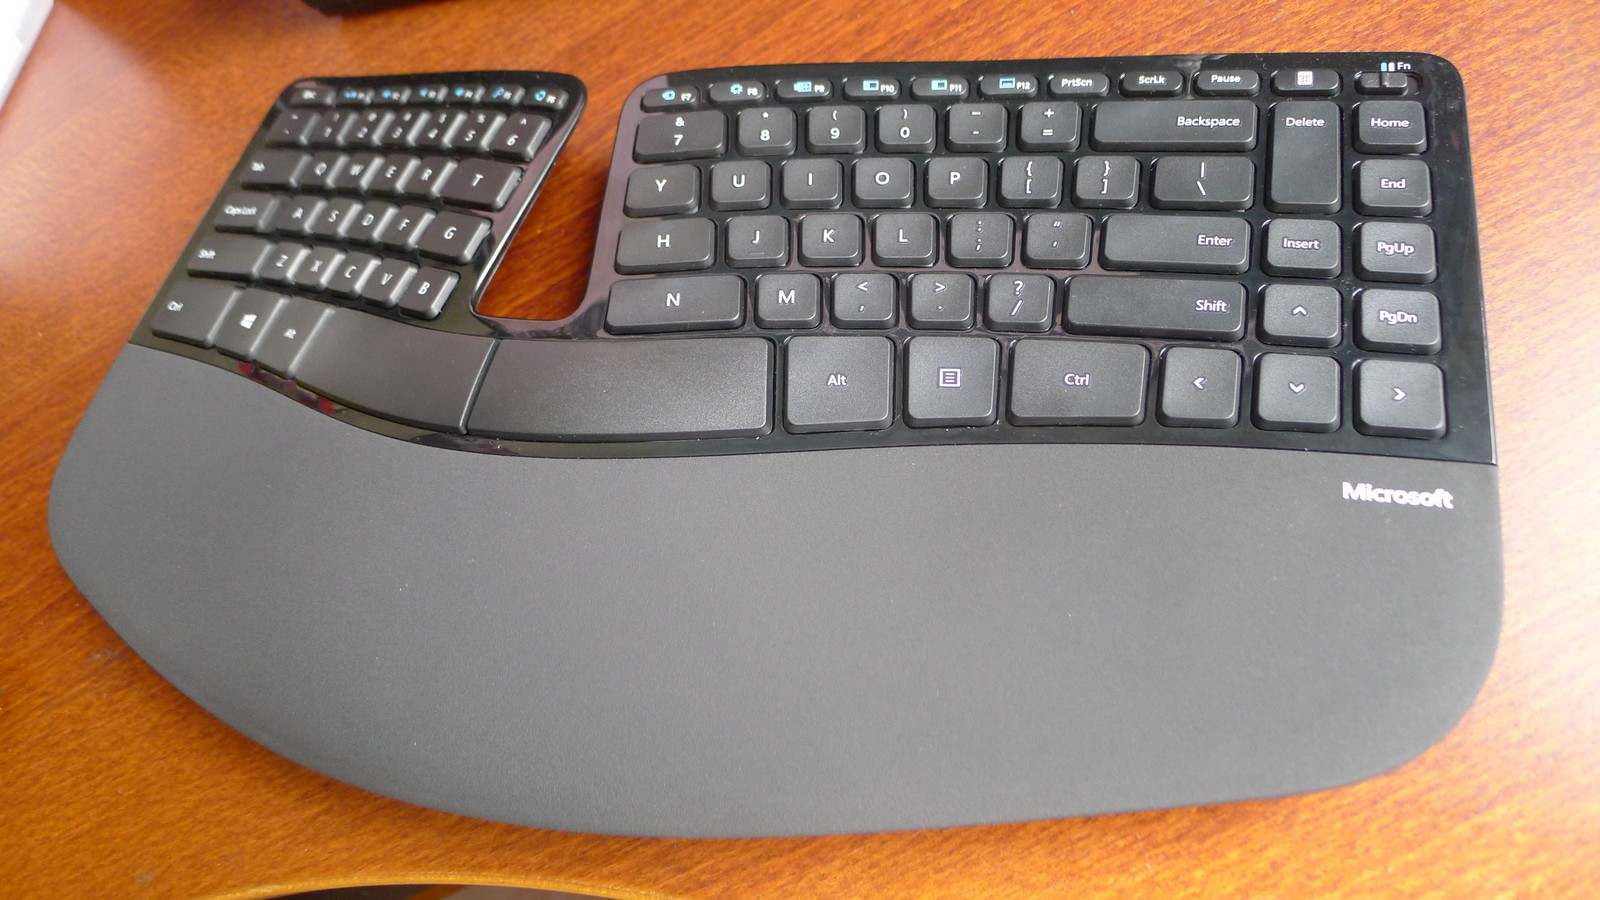 Hands On Microsoft Sculpt Ergonomic Desktop Techgoondu